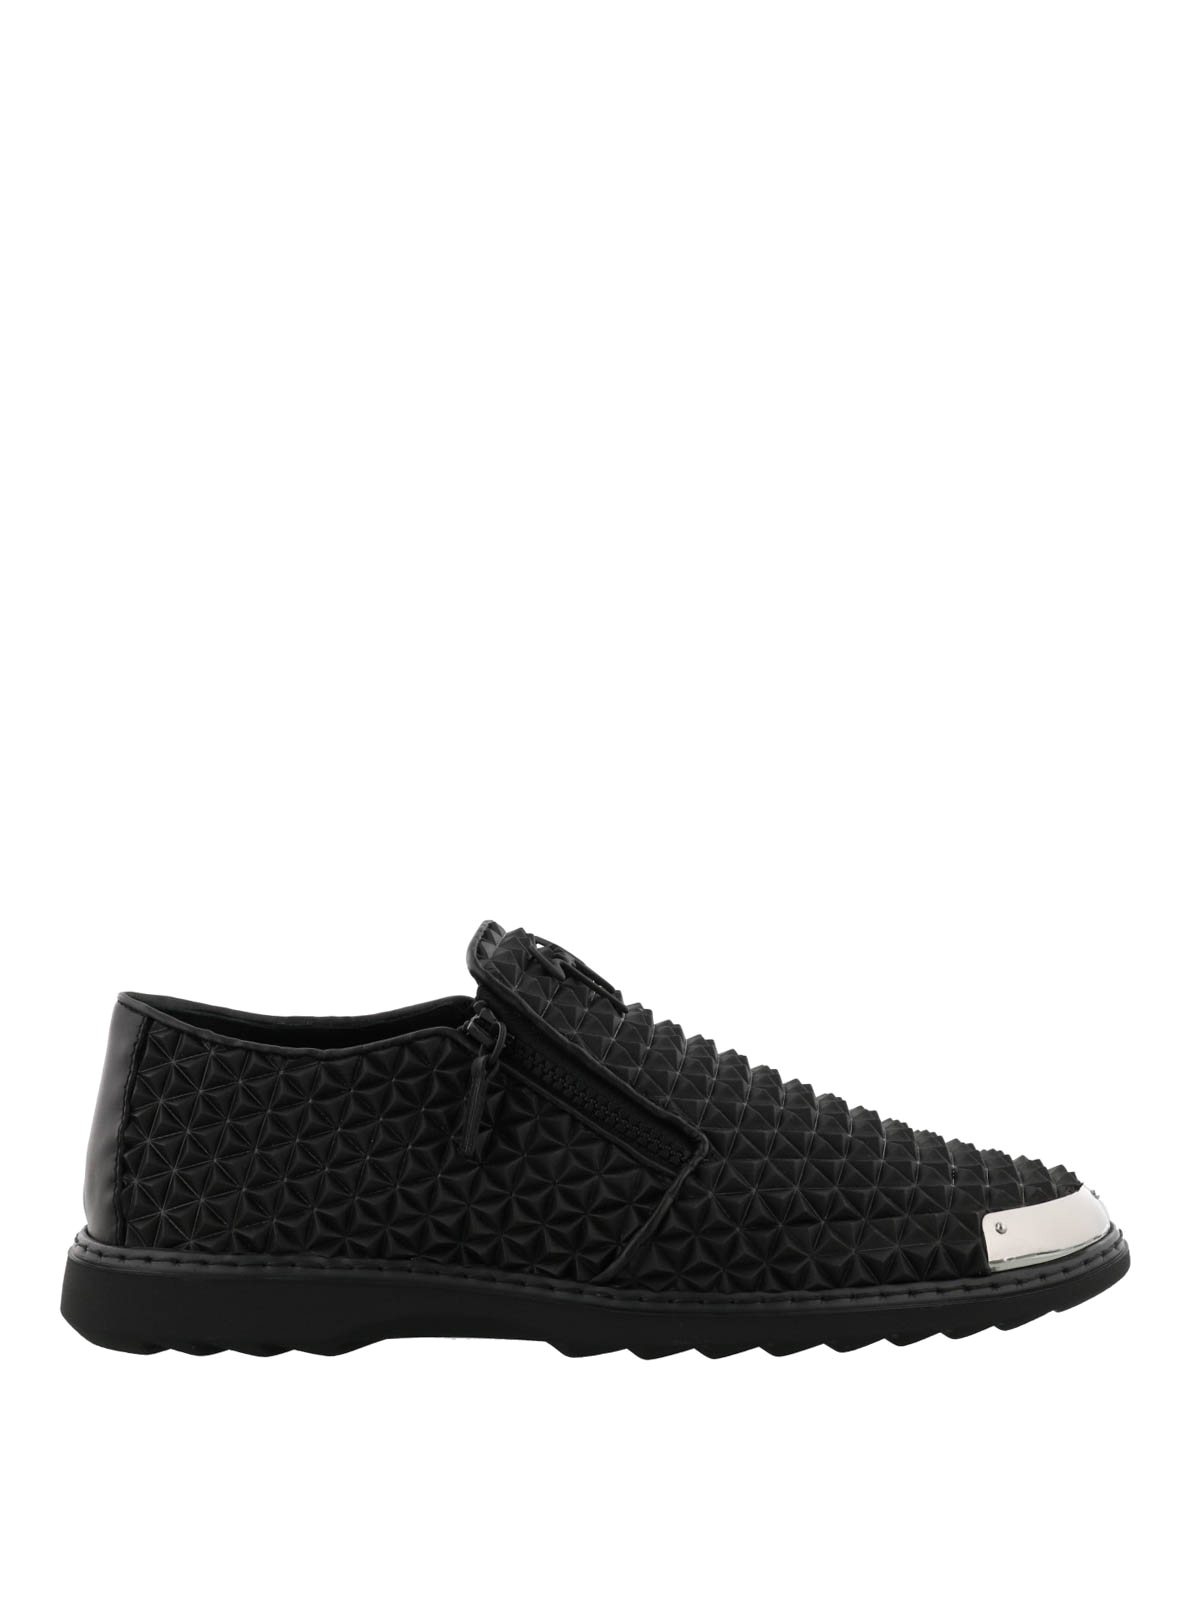 28ba6cd58cef Giuseppe Zanotti Sneakers Alibaba Giuseppe Zanotti Store